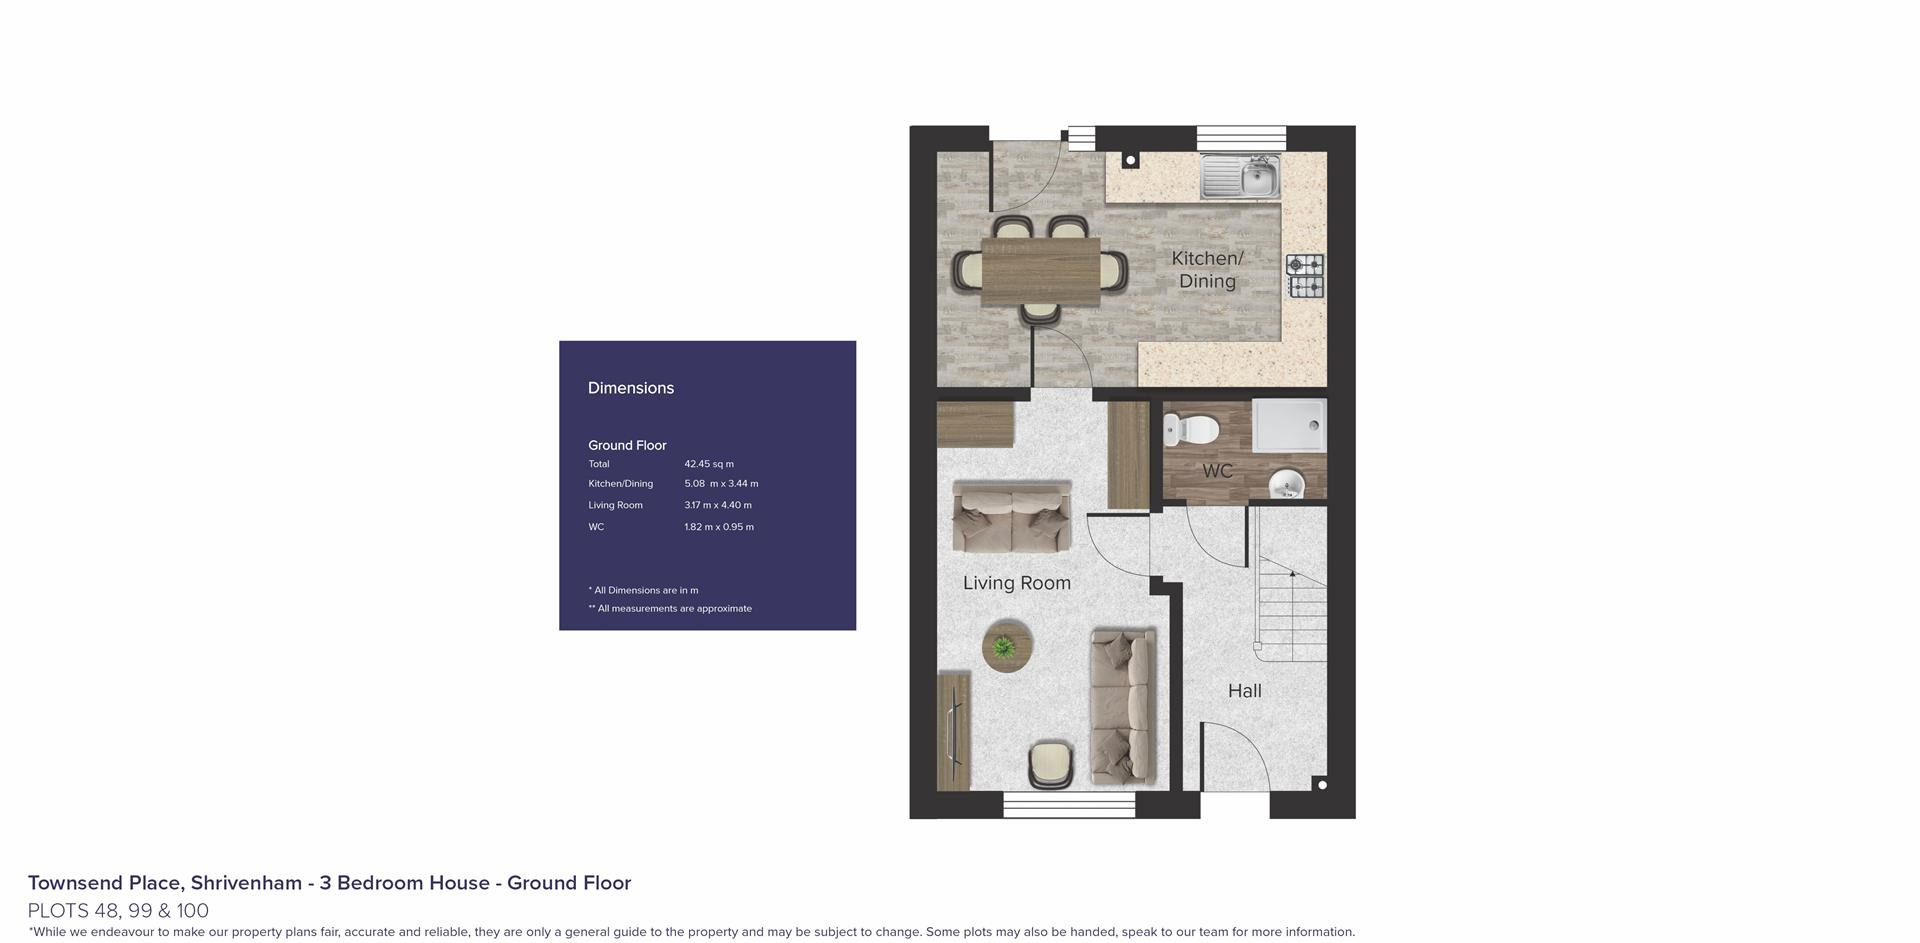 Townsend Place, Shrivenham_Plots 48, 99 & 100_GF_B